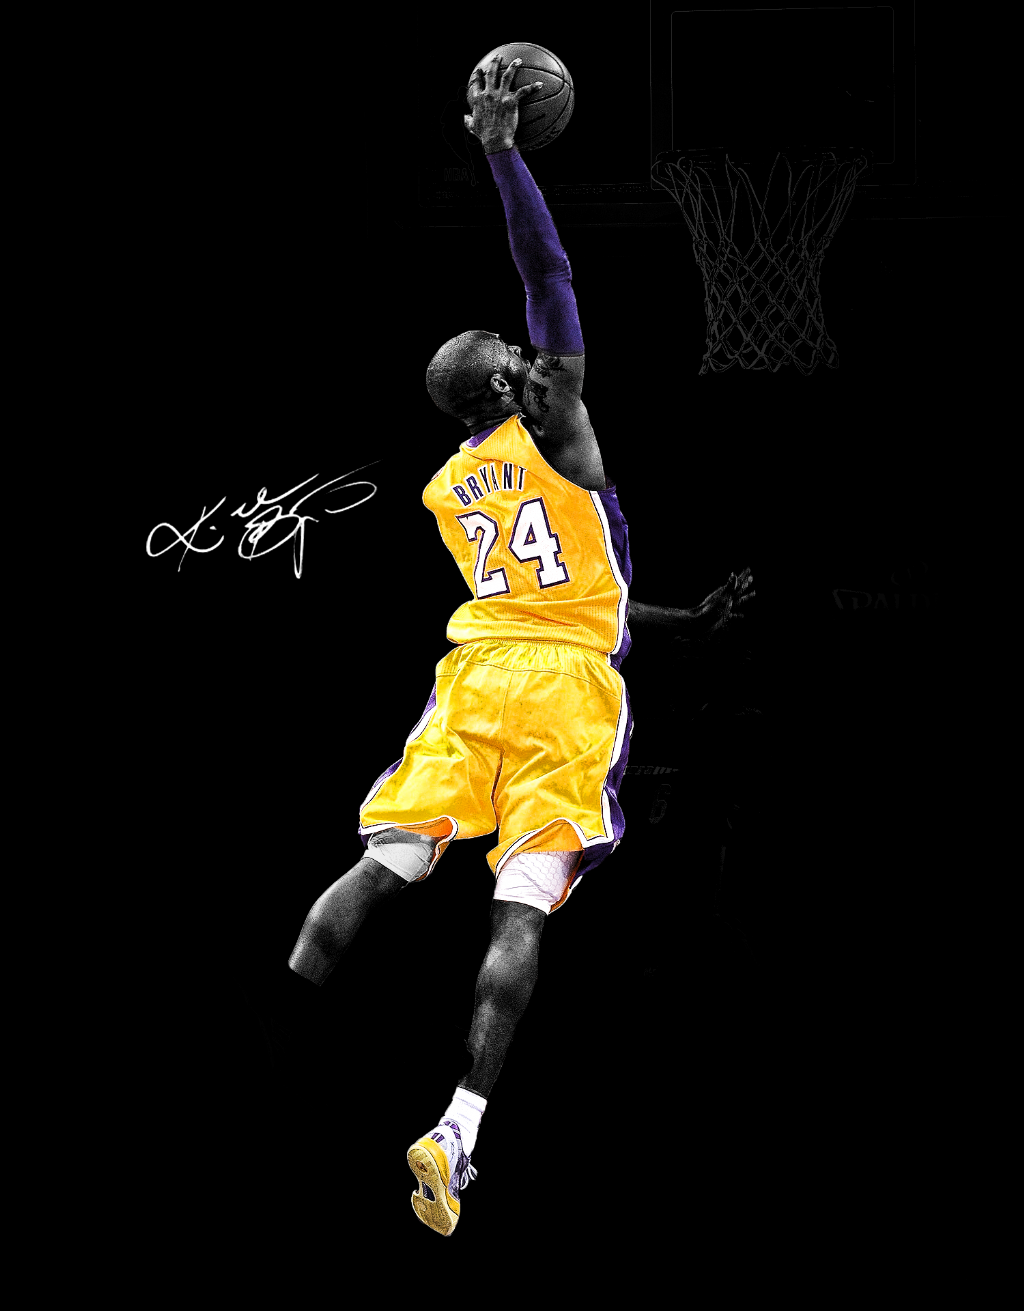 Pin By Kaung Zan On Kobe Bryant Black Mamba In 2020 Kobe Bryant Dunk Kobe Bryant Wallpaper Kobe Bryant Poster